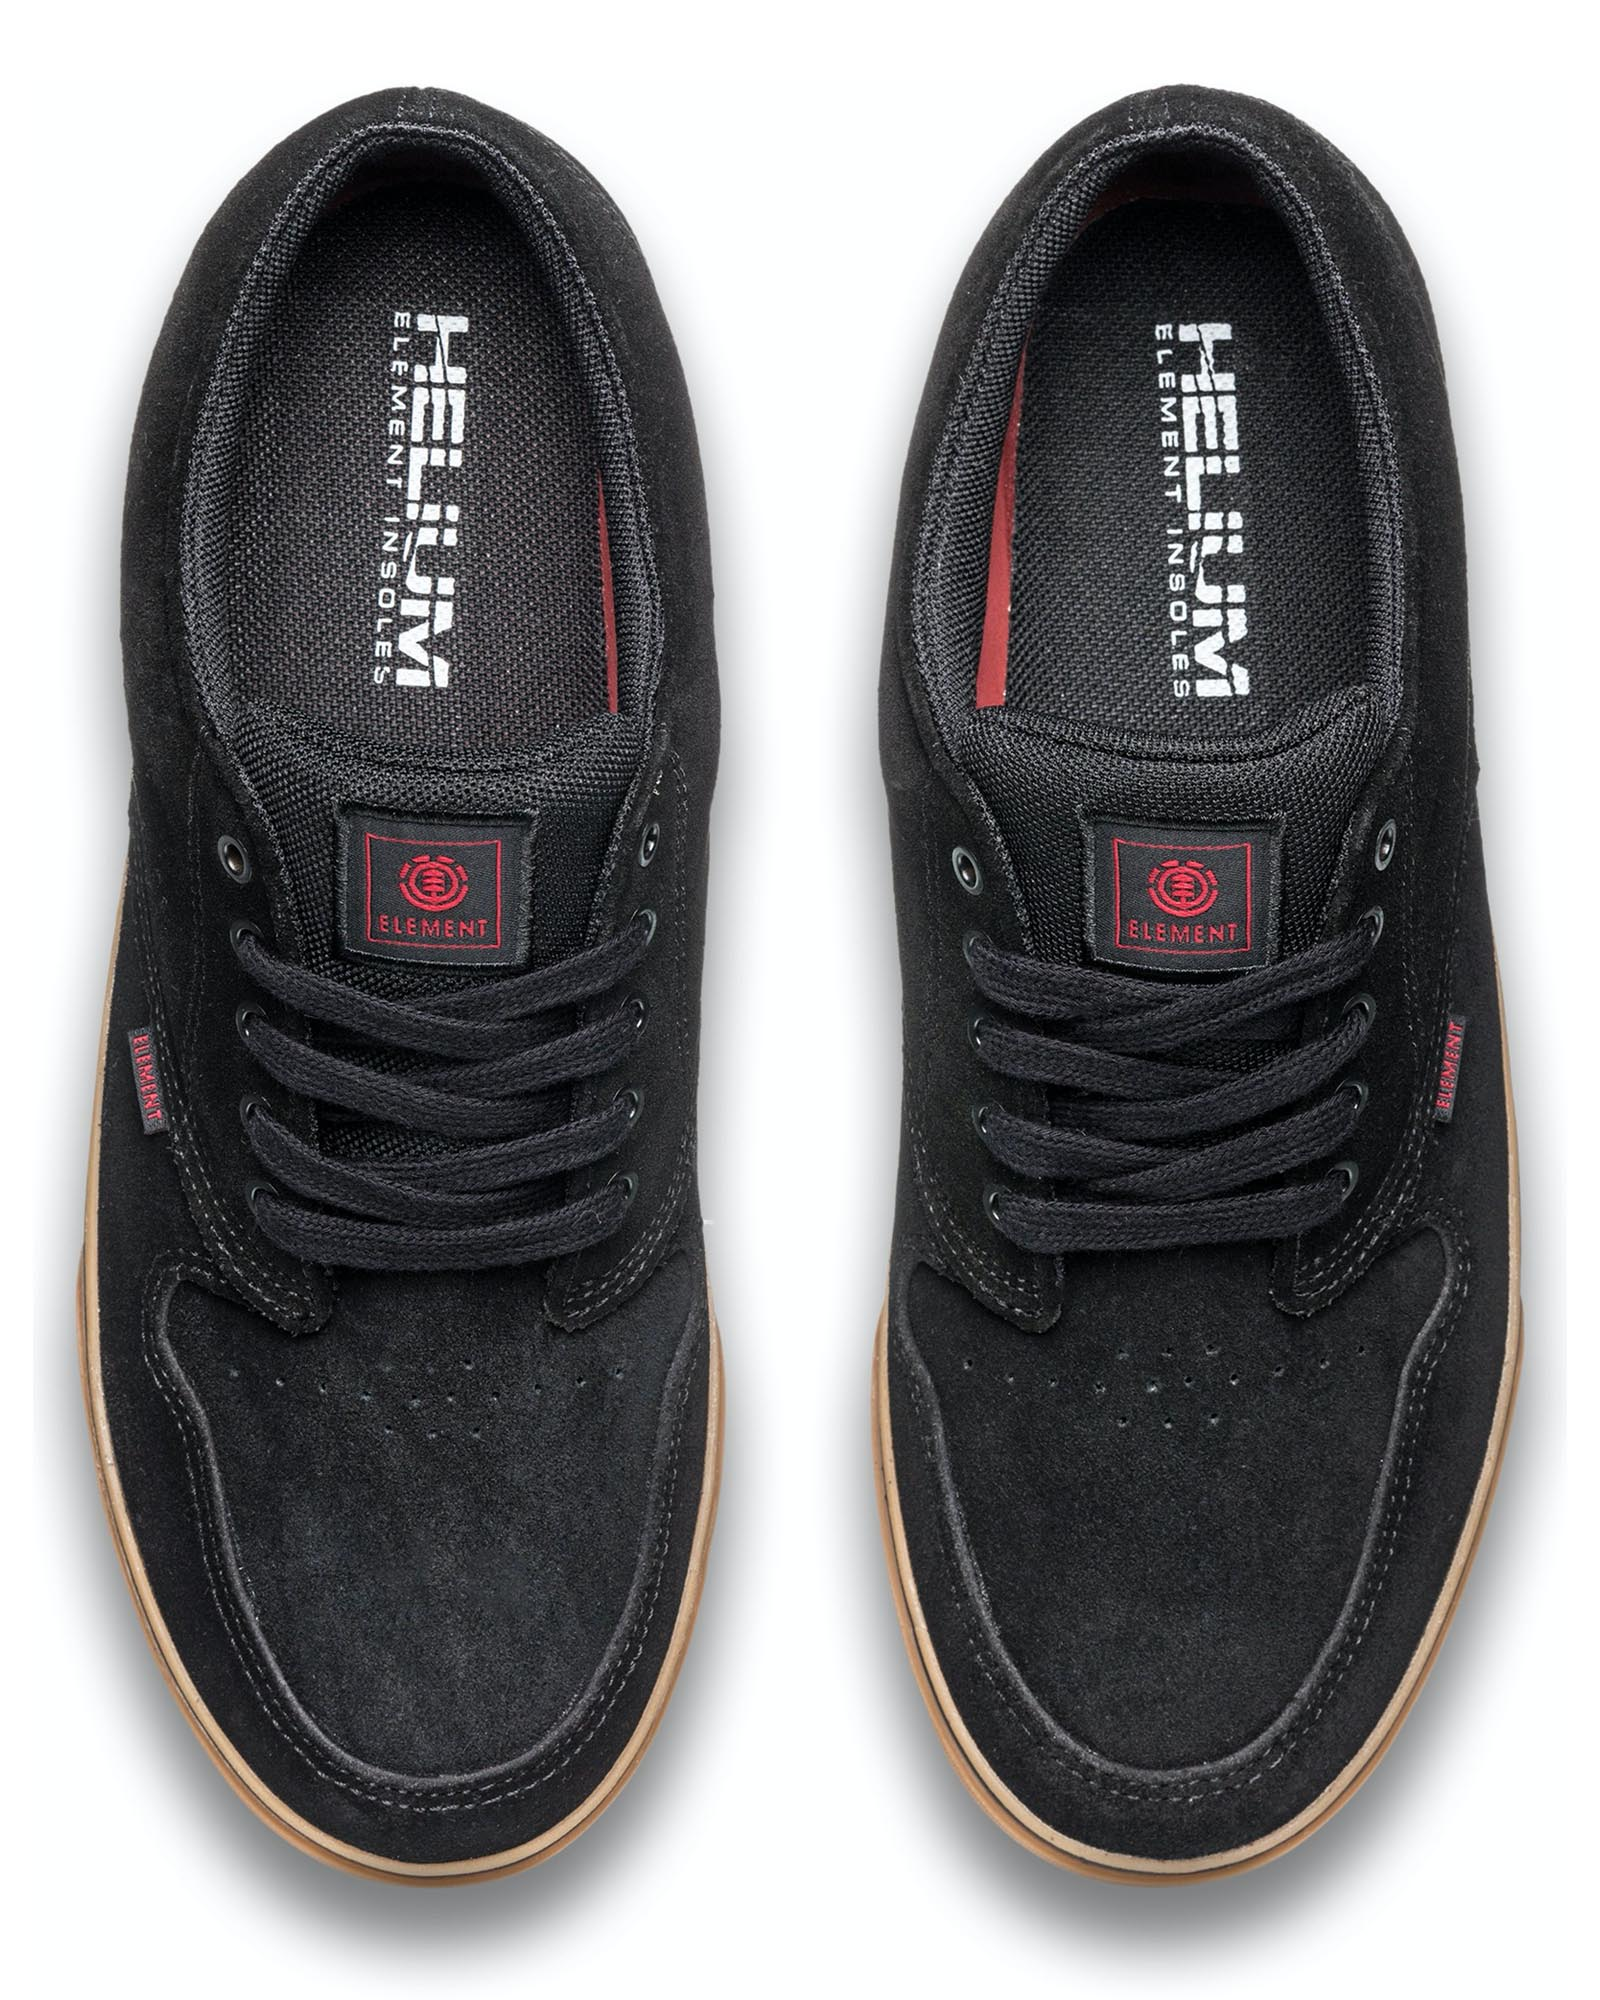 Element FW 2021 Skate Footwear